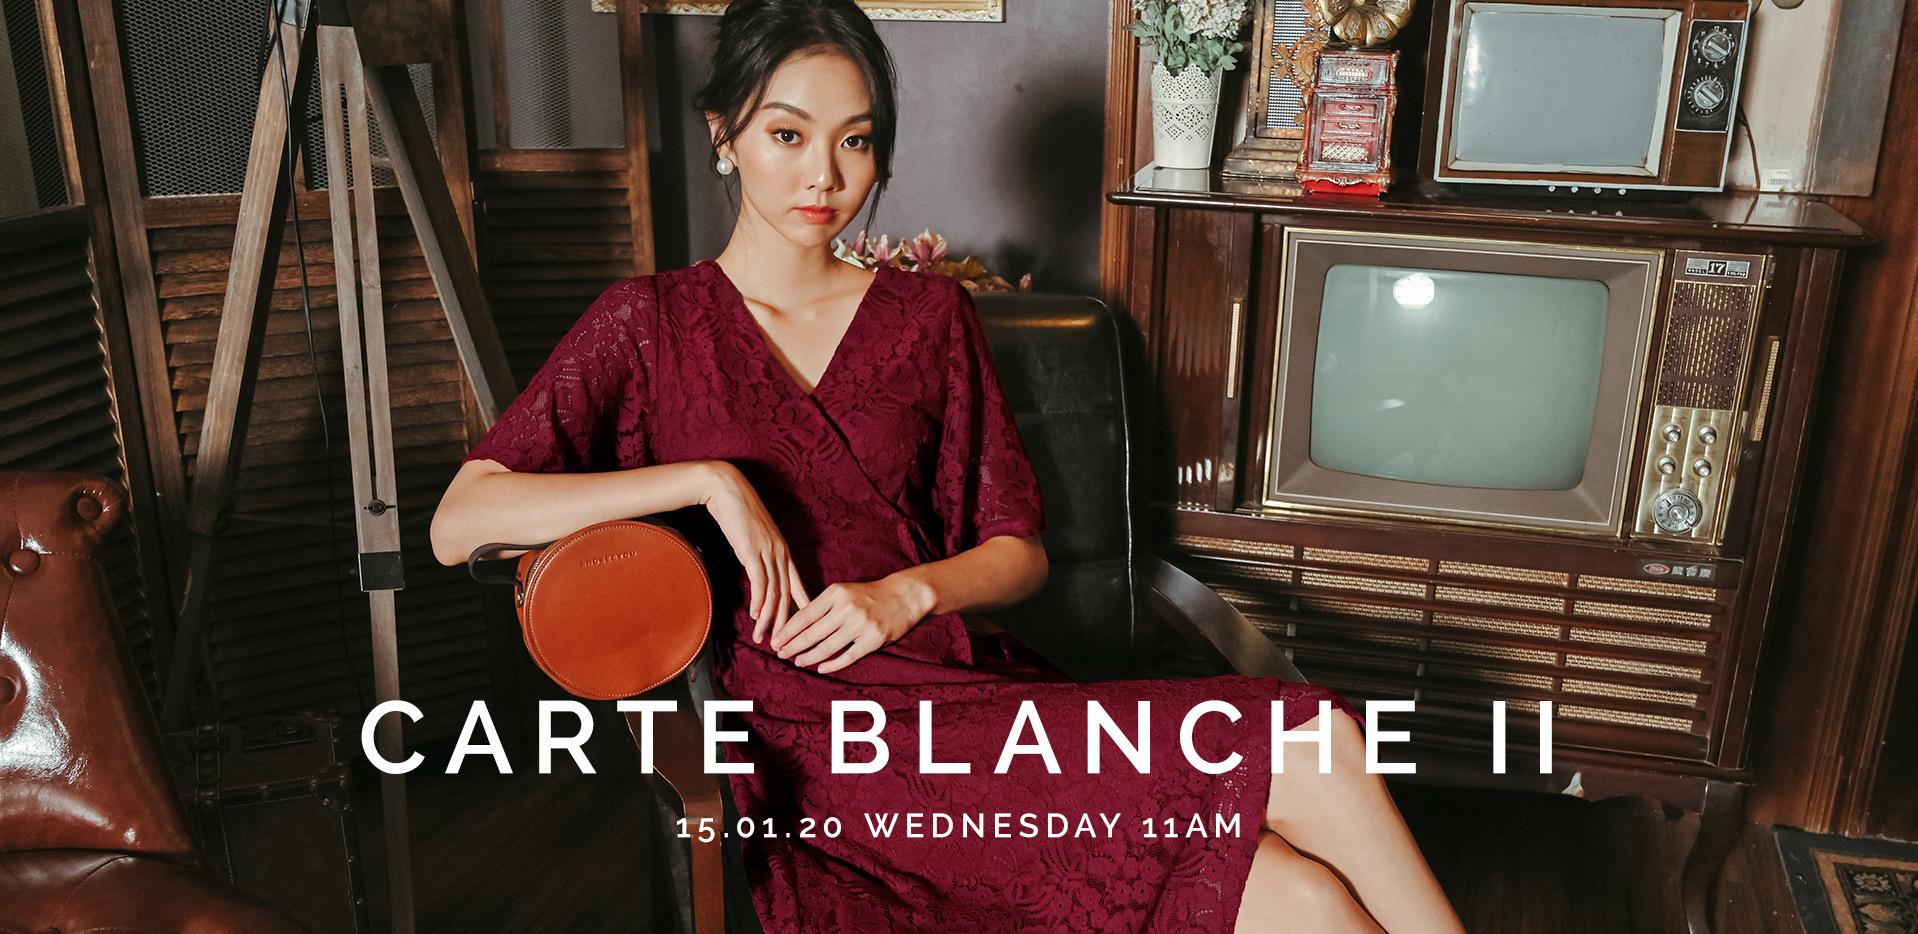 CARTE BLANCHE II